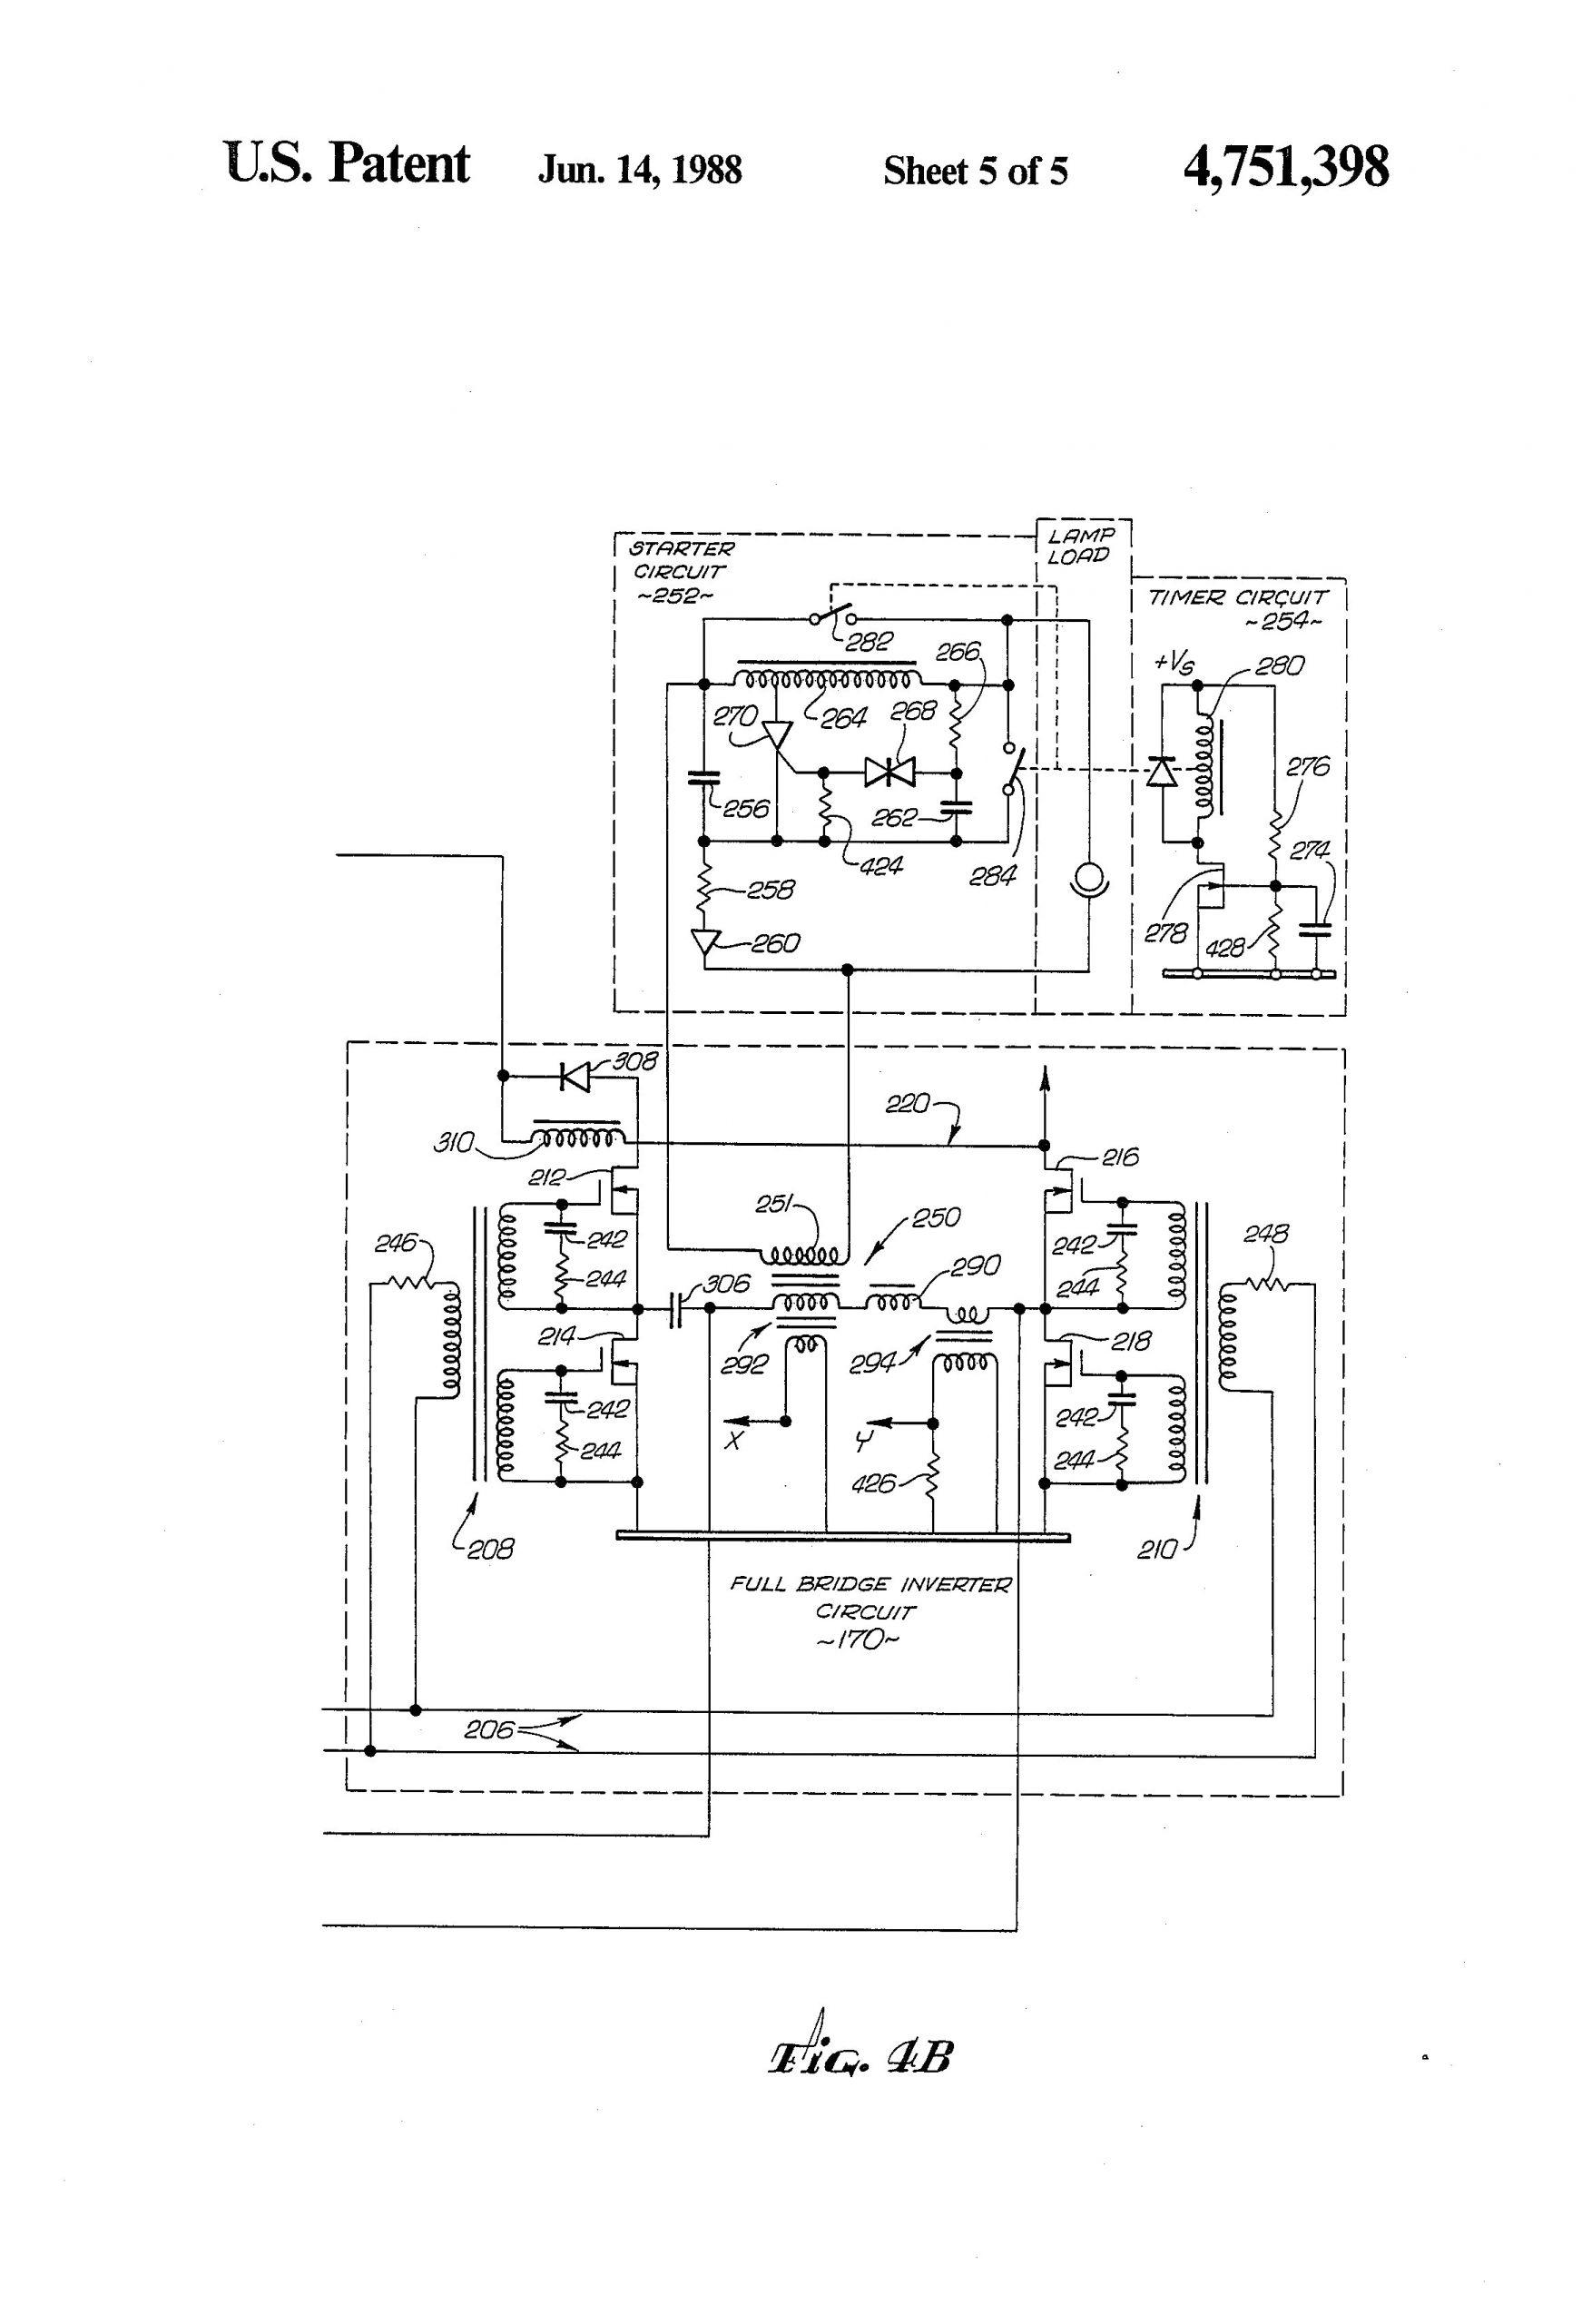 150 Watt Hps Ballast Wiring Diagram